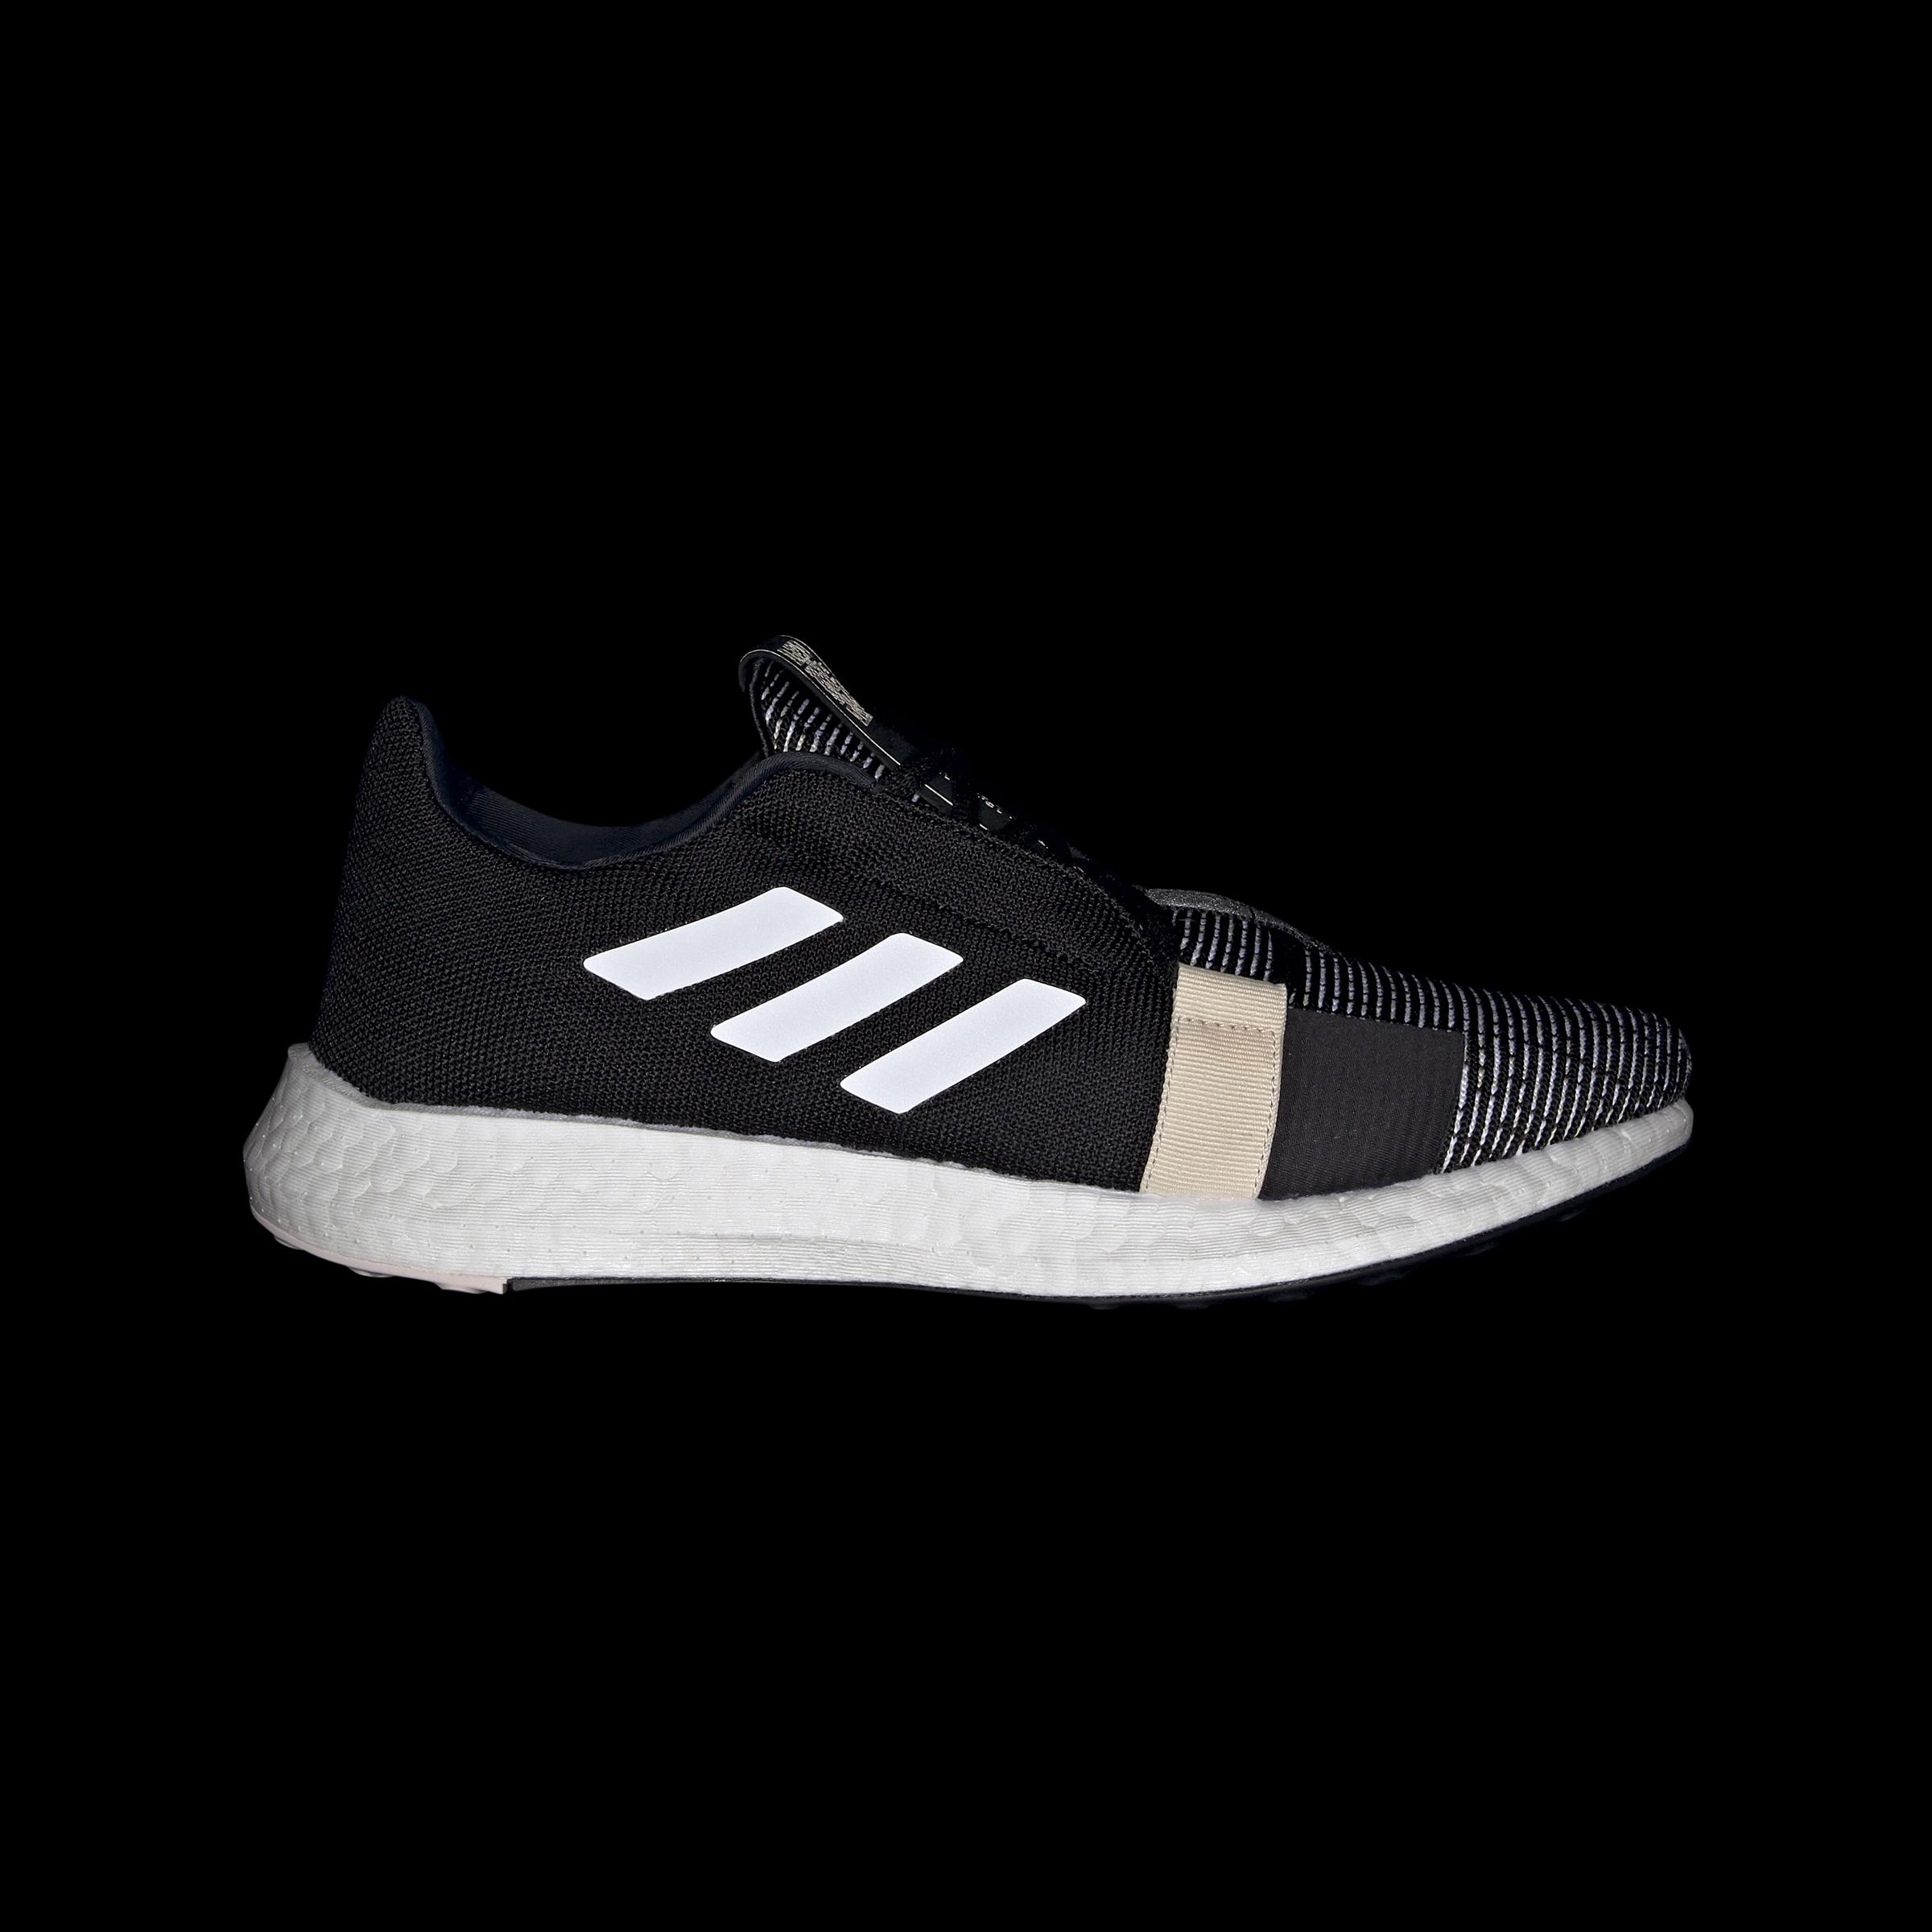 miniature 40 - adidas Senseboost Go Shoes Men's Athletic & Sneakers